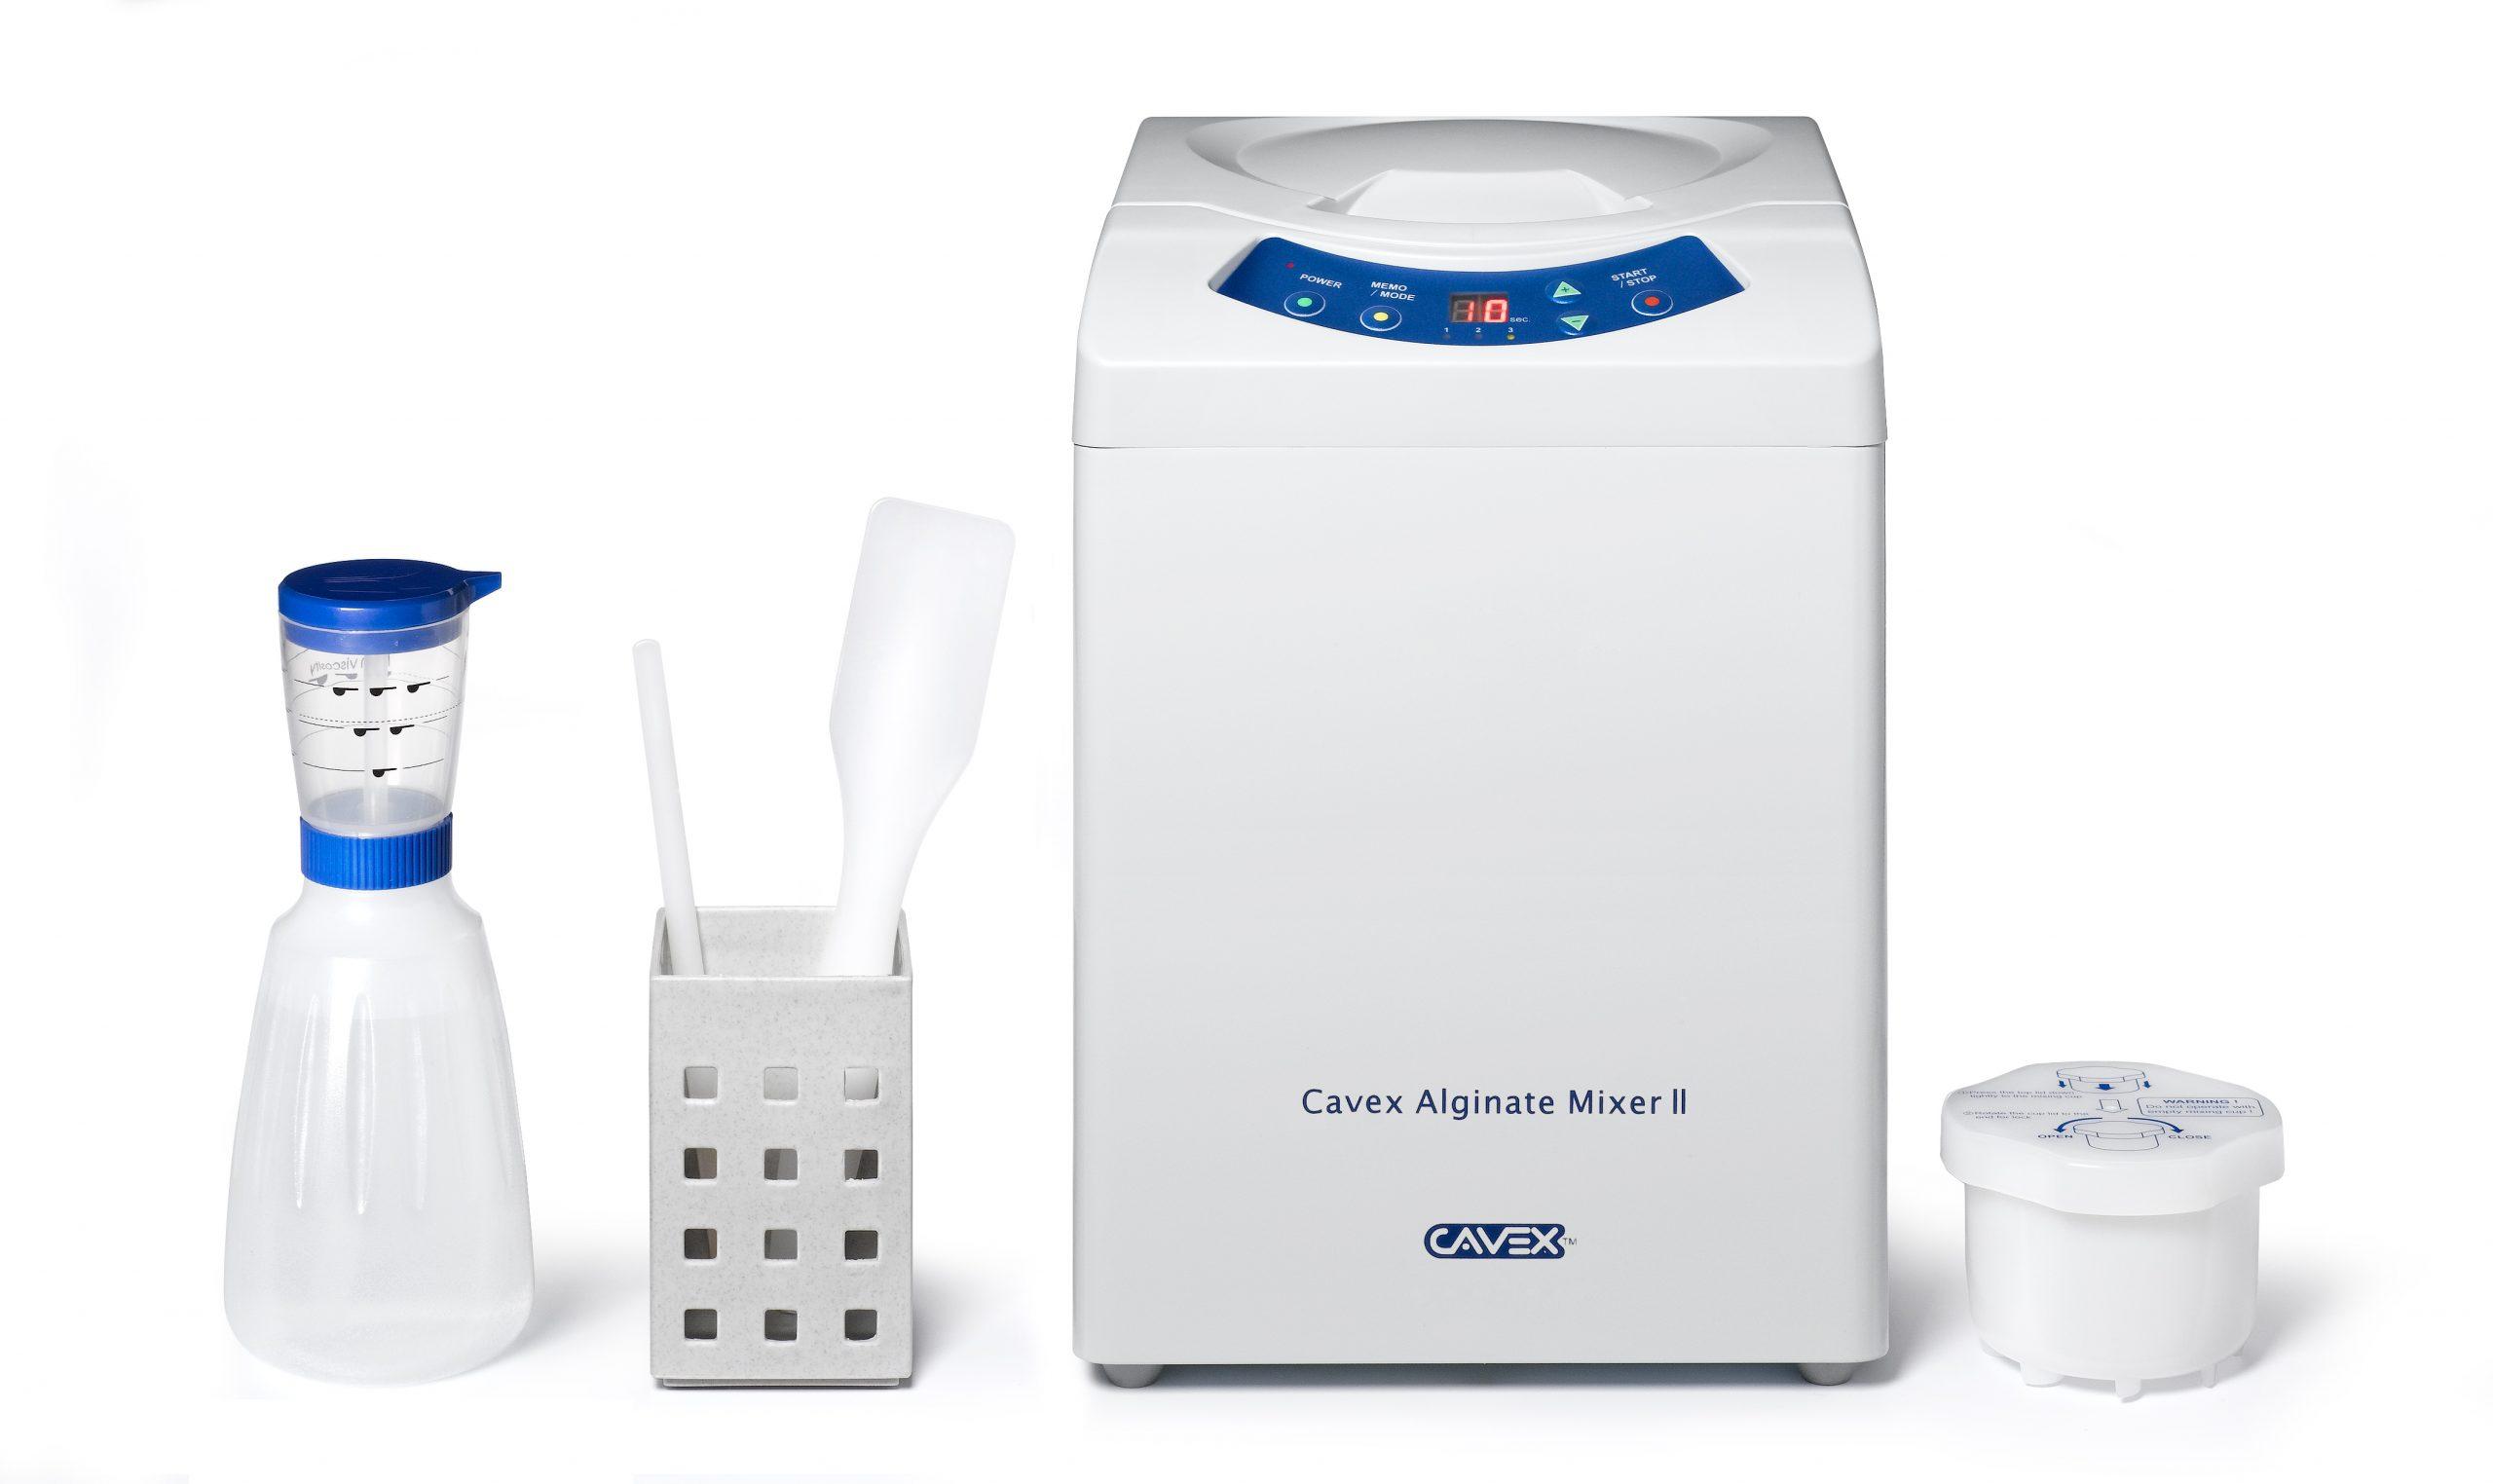 Cavex-Alginate-Mixer-II